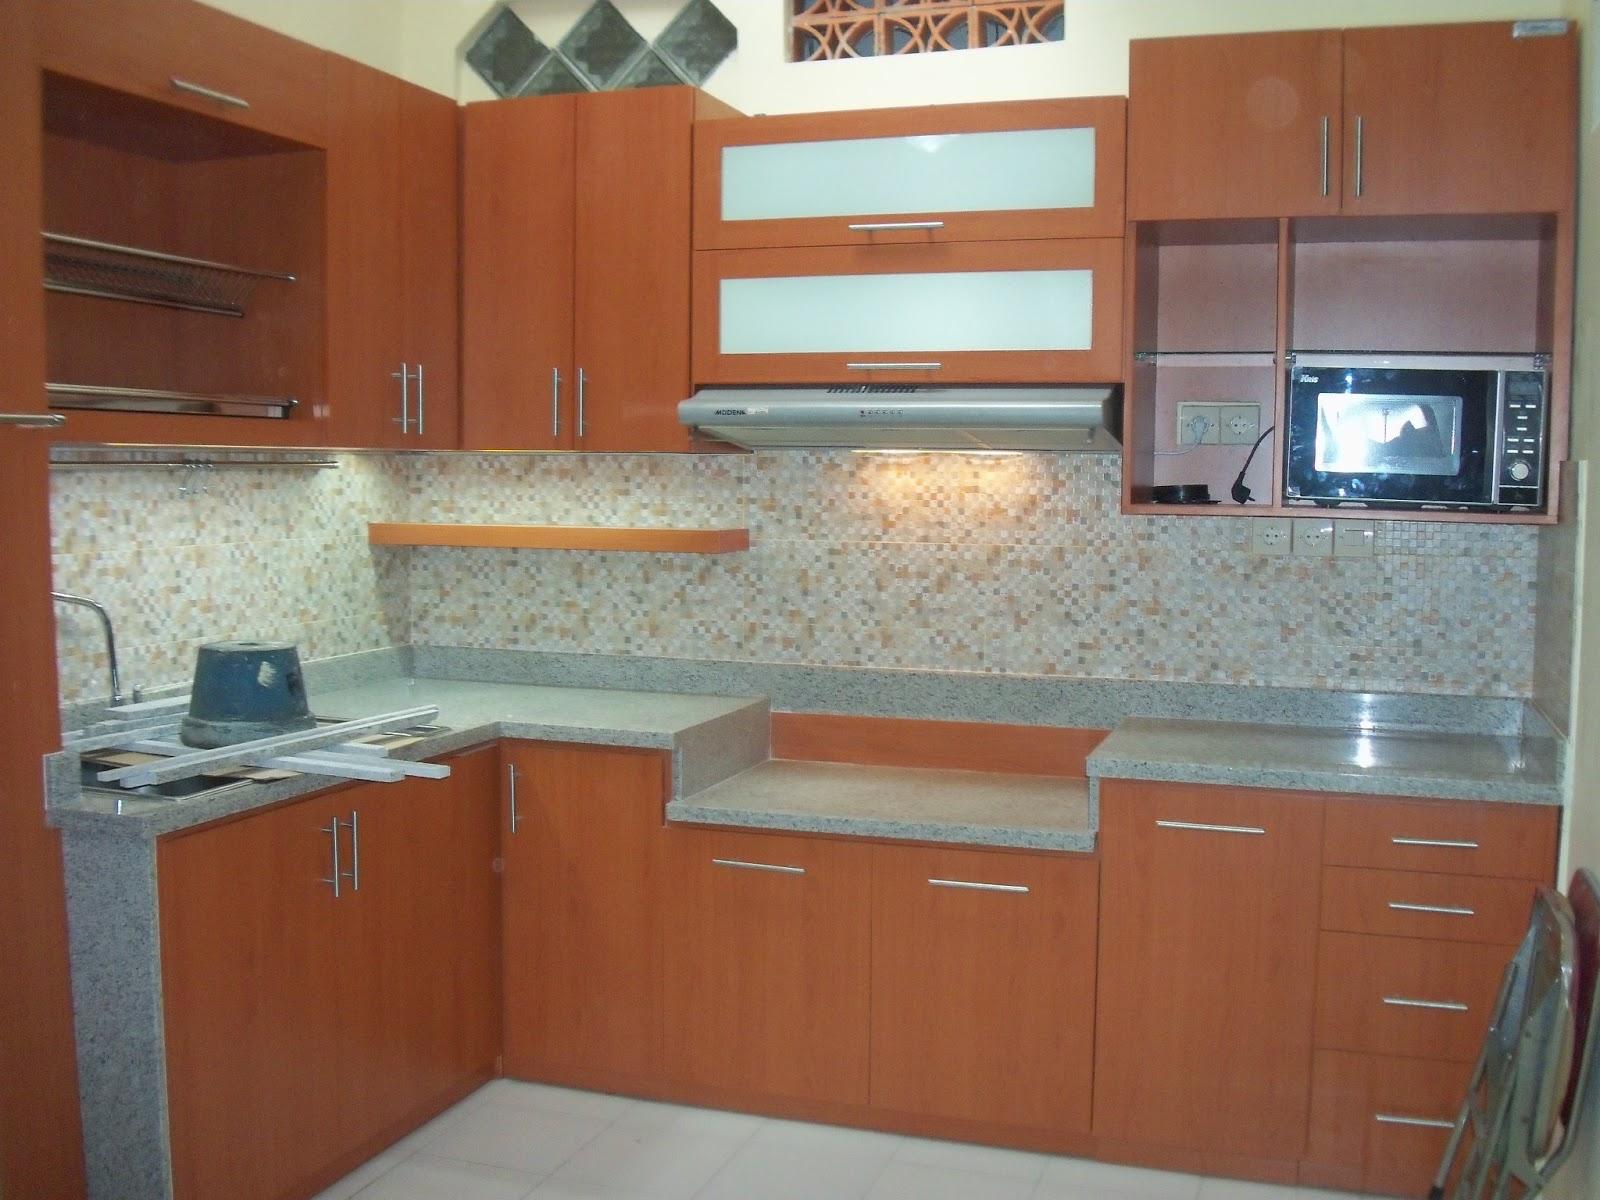 Kitchen set malang star wood ibu nurdiana malang for Ukuran kitchen set